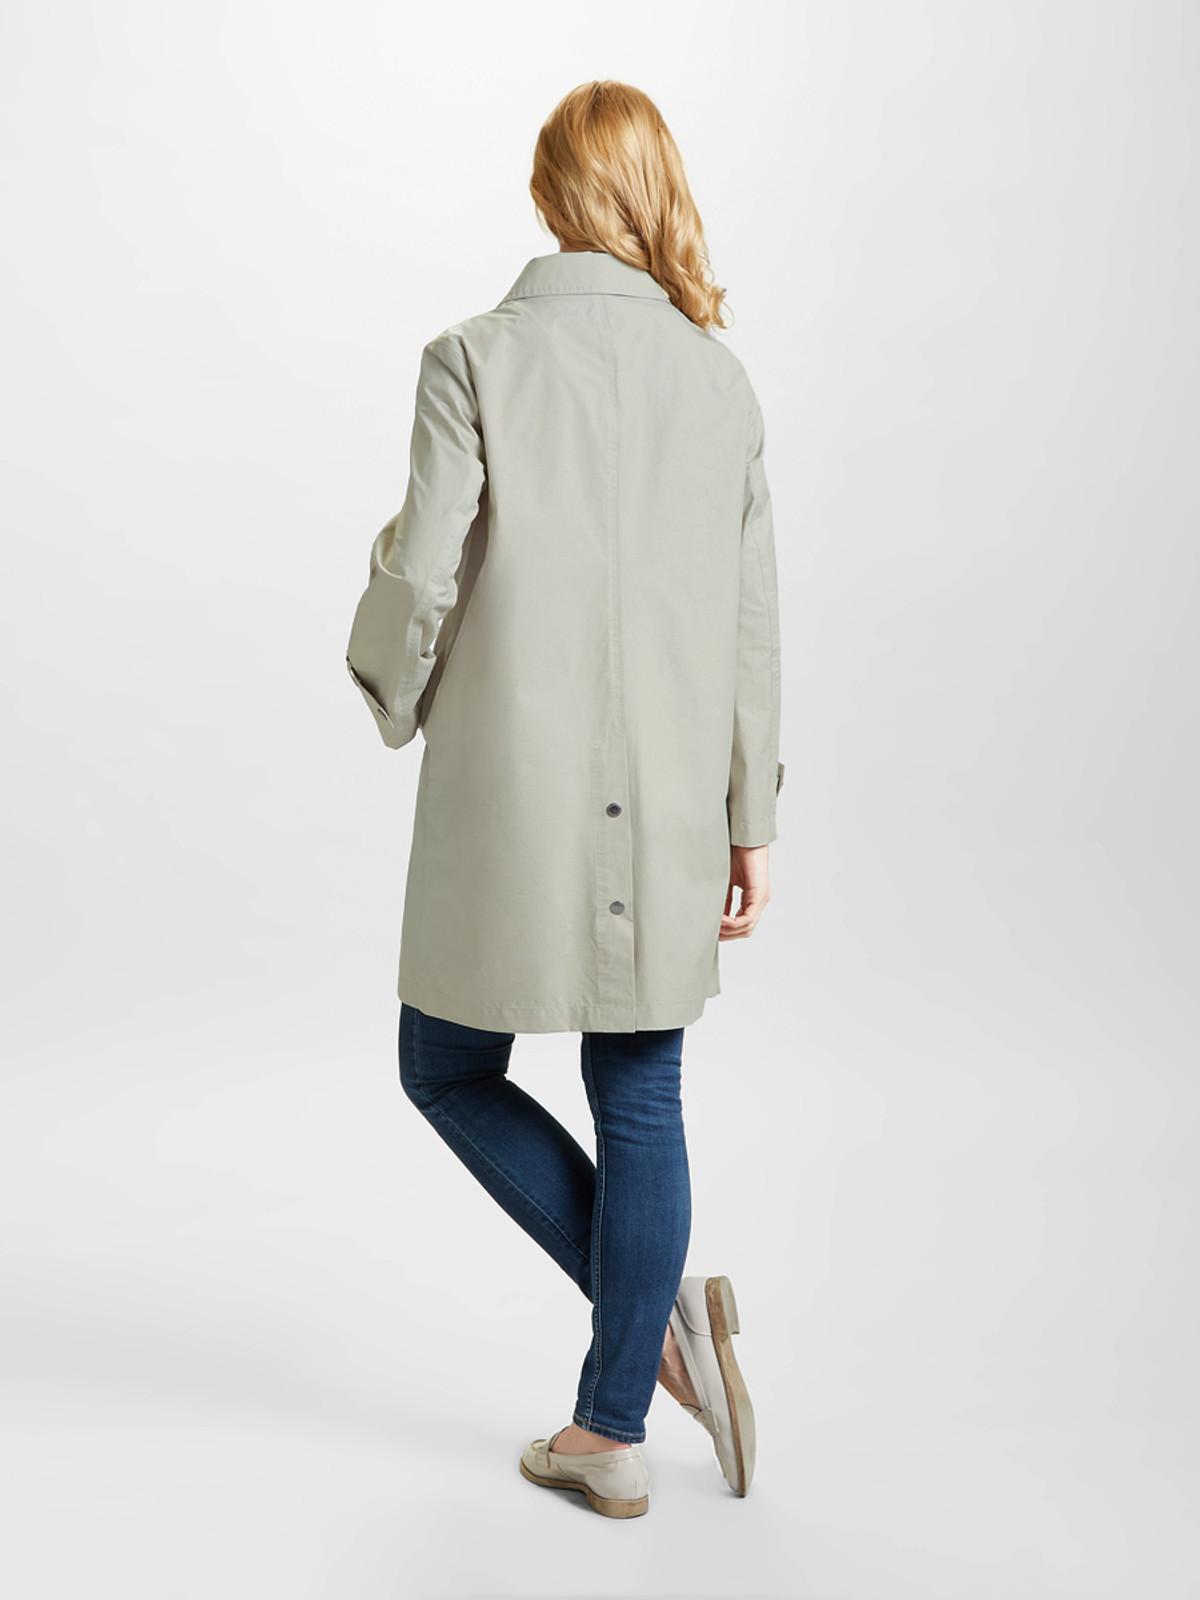 BOTTANY BAY – Contemporary Urban Coat, Linen/Blush